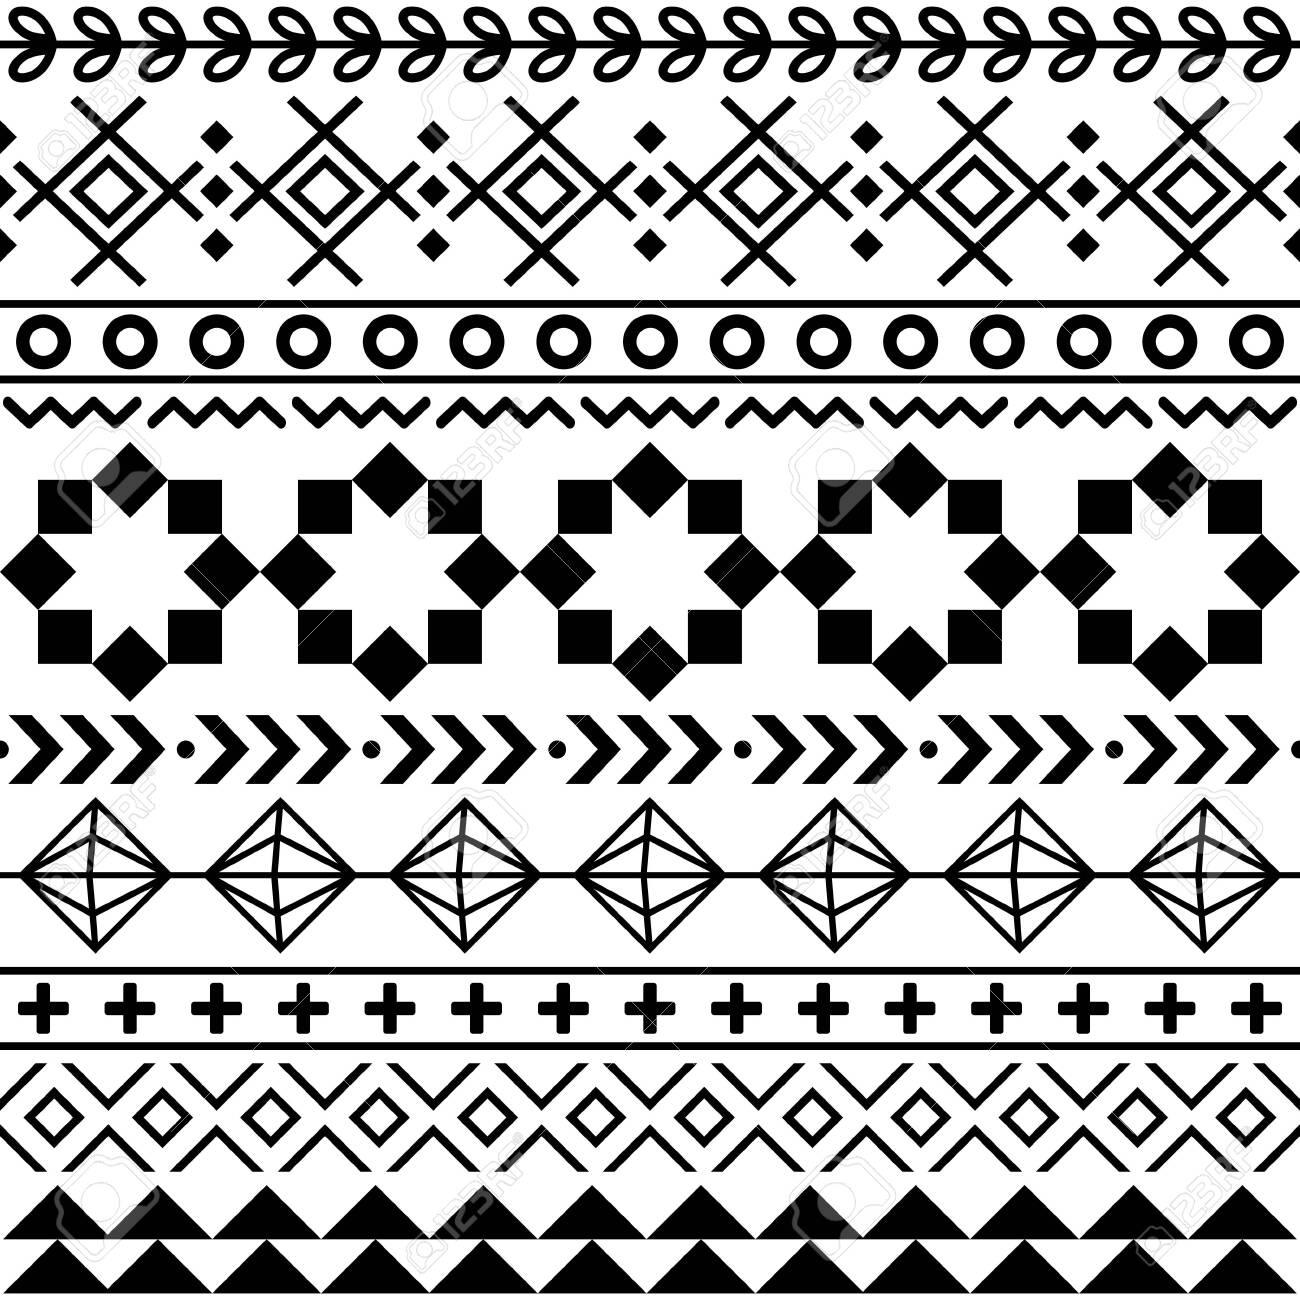 Tribal Aztec seamless geometric pattern, Navajo vector design in black pattern on white background - 141152304